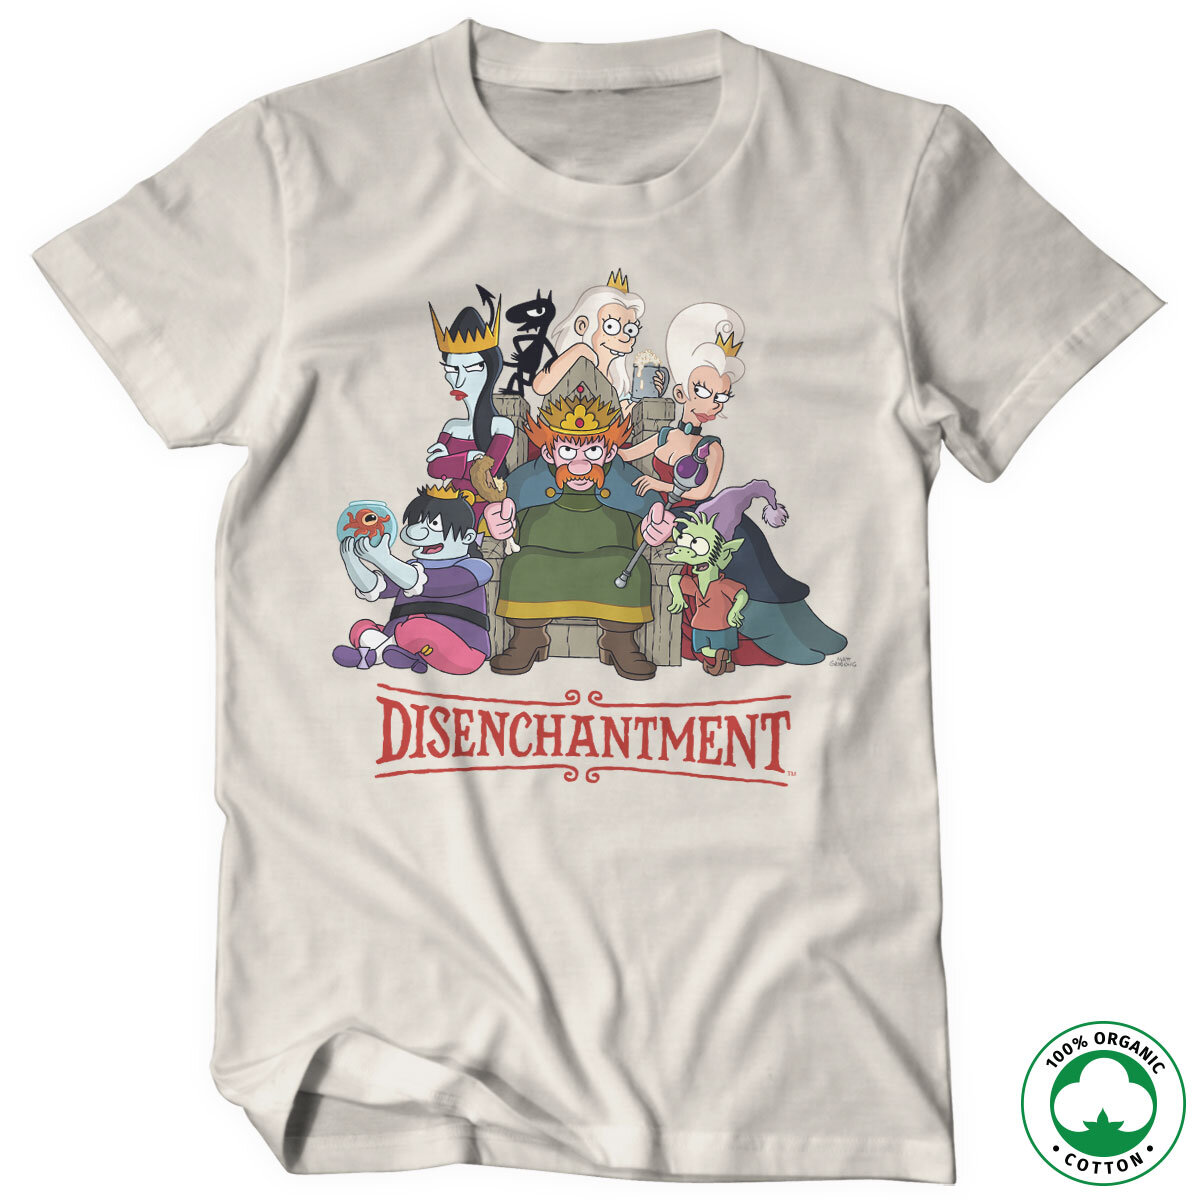 Disenchantment Organic Tee